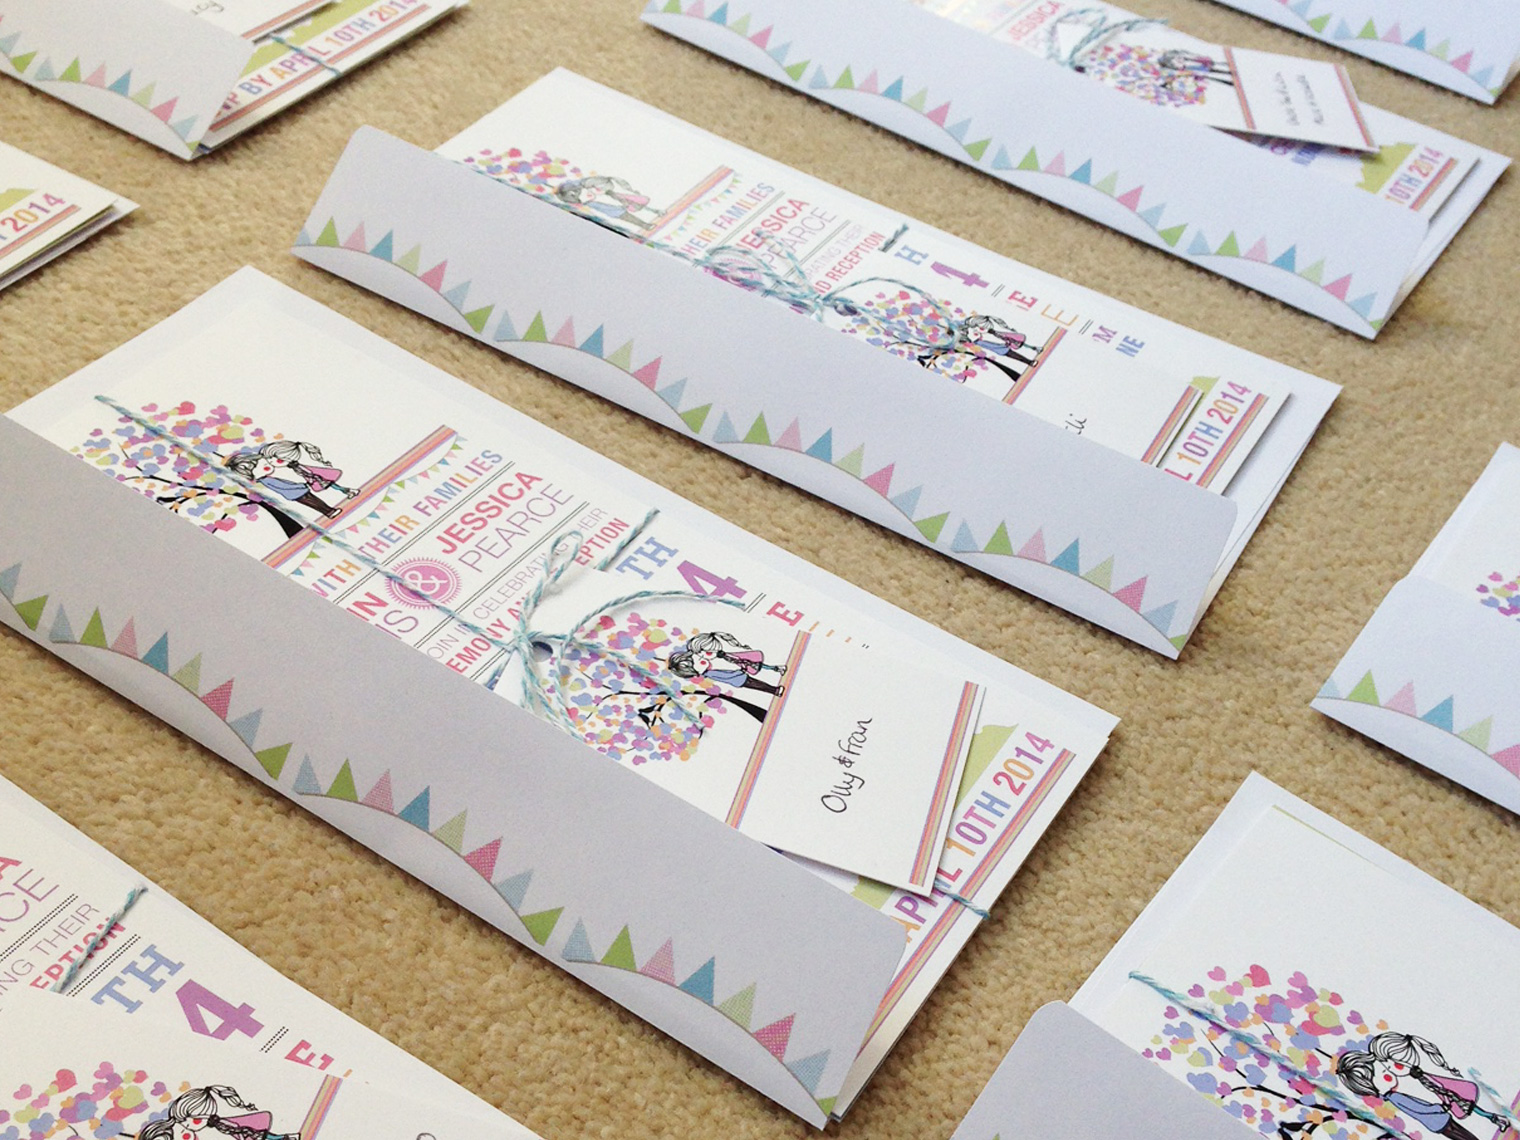 Wedding Invites   Web Design Worcestershire & Herefordshire   Graphic Design Worcestershire & Herefordshire   e-Commerce Website Design   Website Designers Malvern, Worcestershire & Herefordshire   Design in the Shires